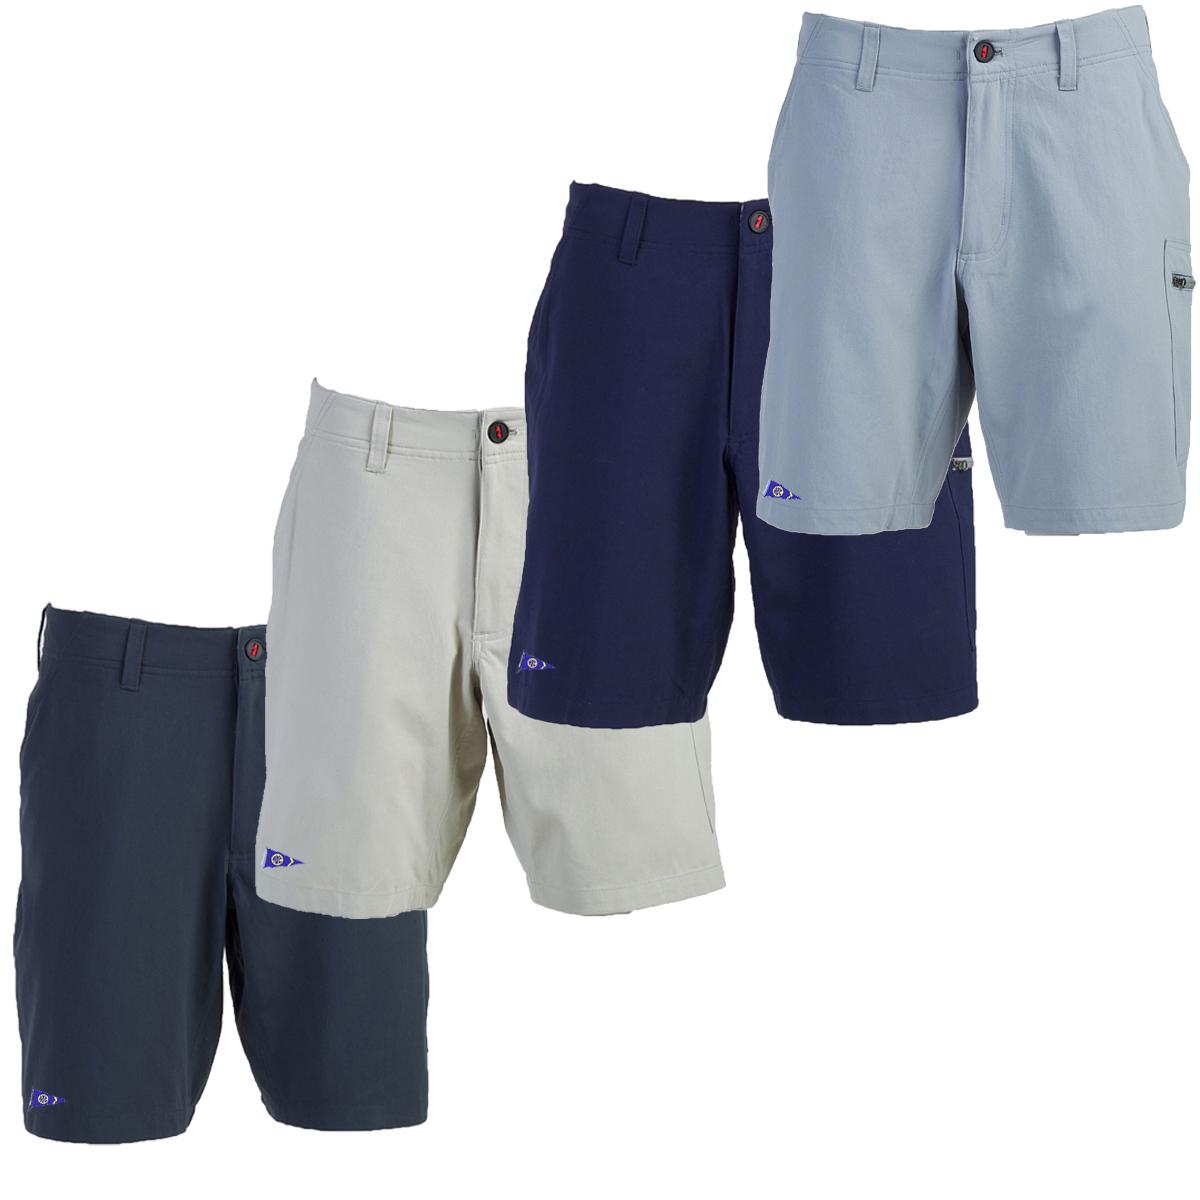 Avalon Yacht Club -  Men's Scrambler Shorts (AVYC401)